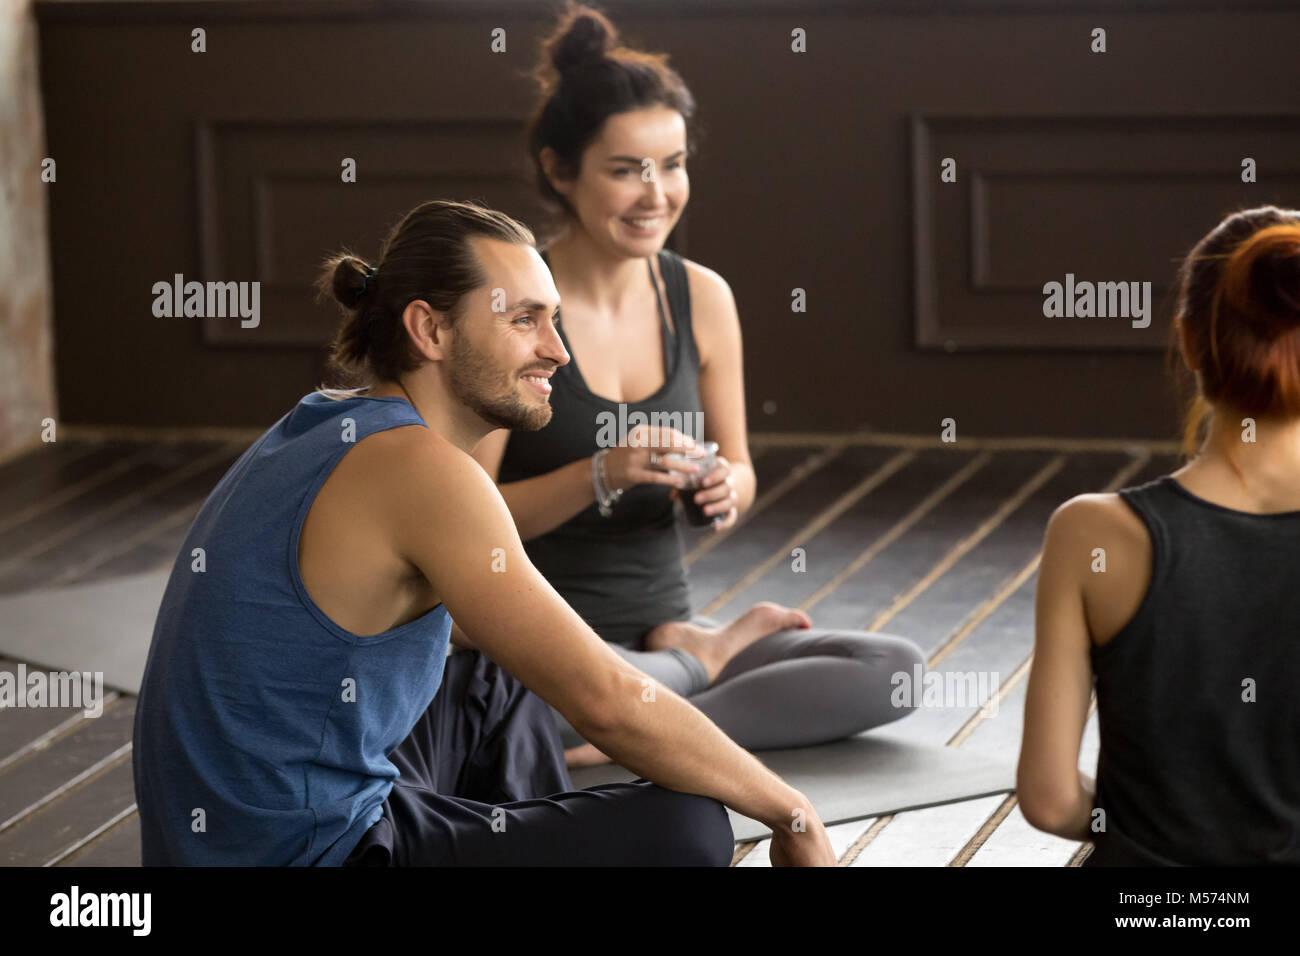 Smiling mindful yogi man sitting on mat at group training - Stock Image